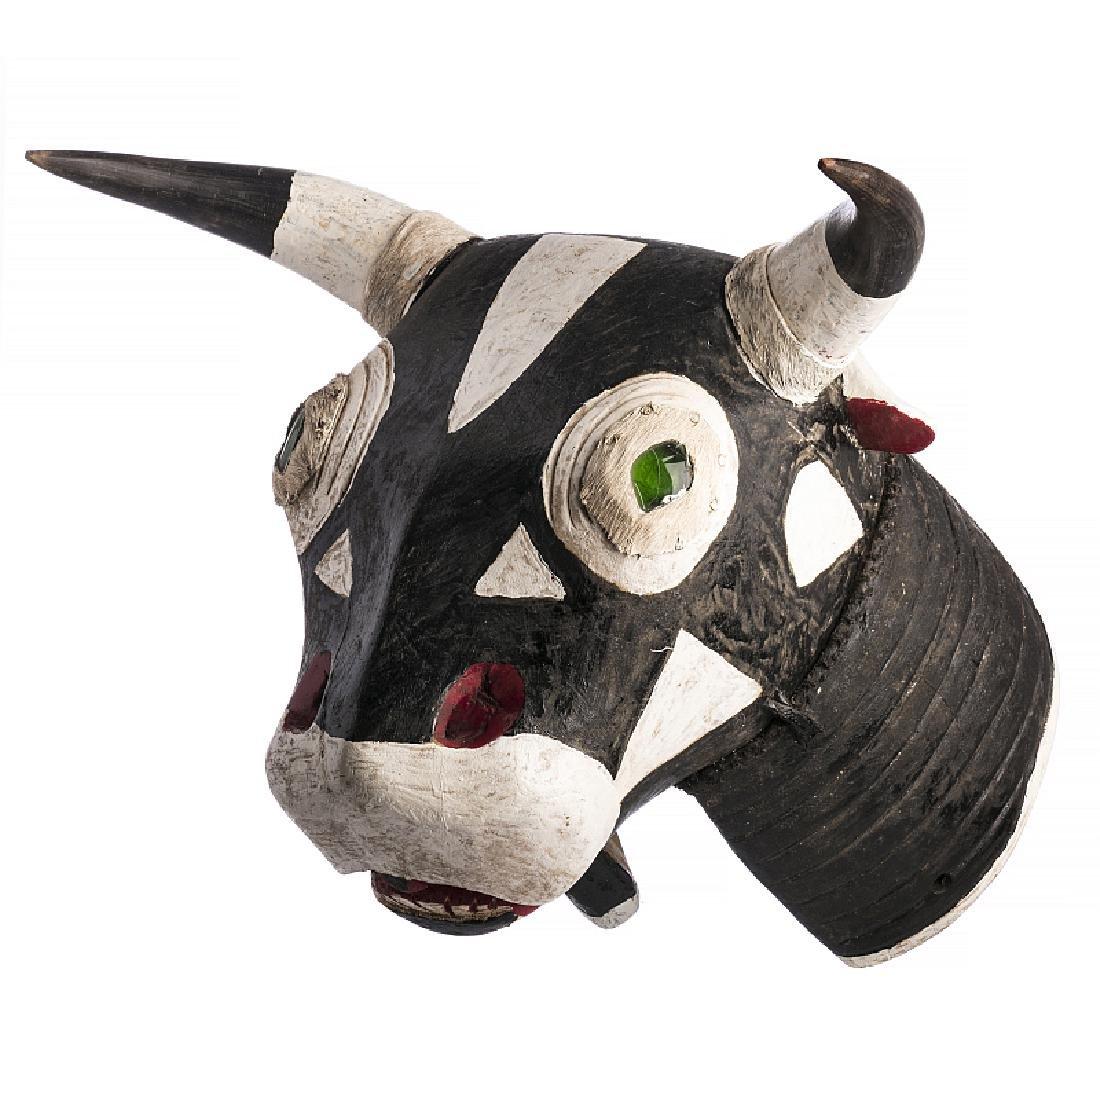 BIDJOGO - Vaca Brutu mask